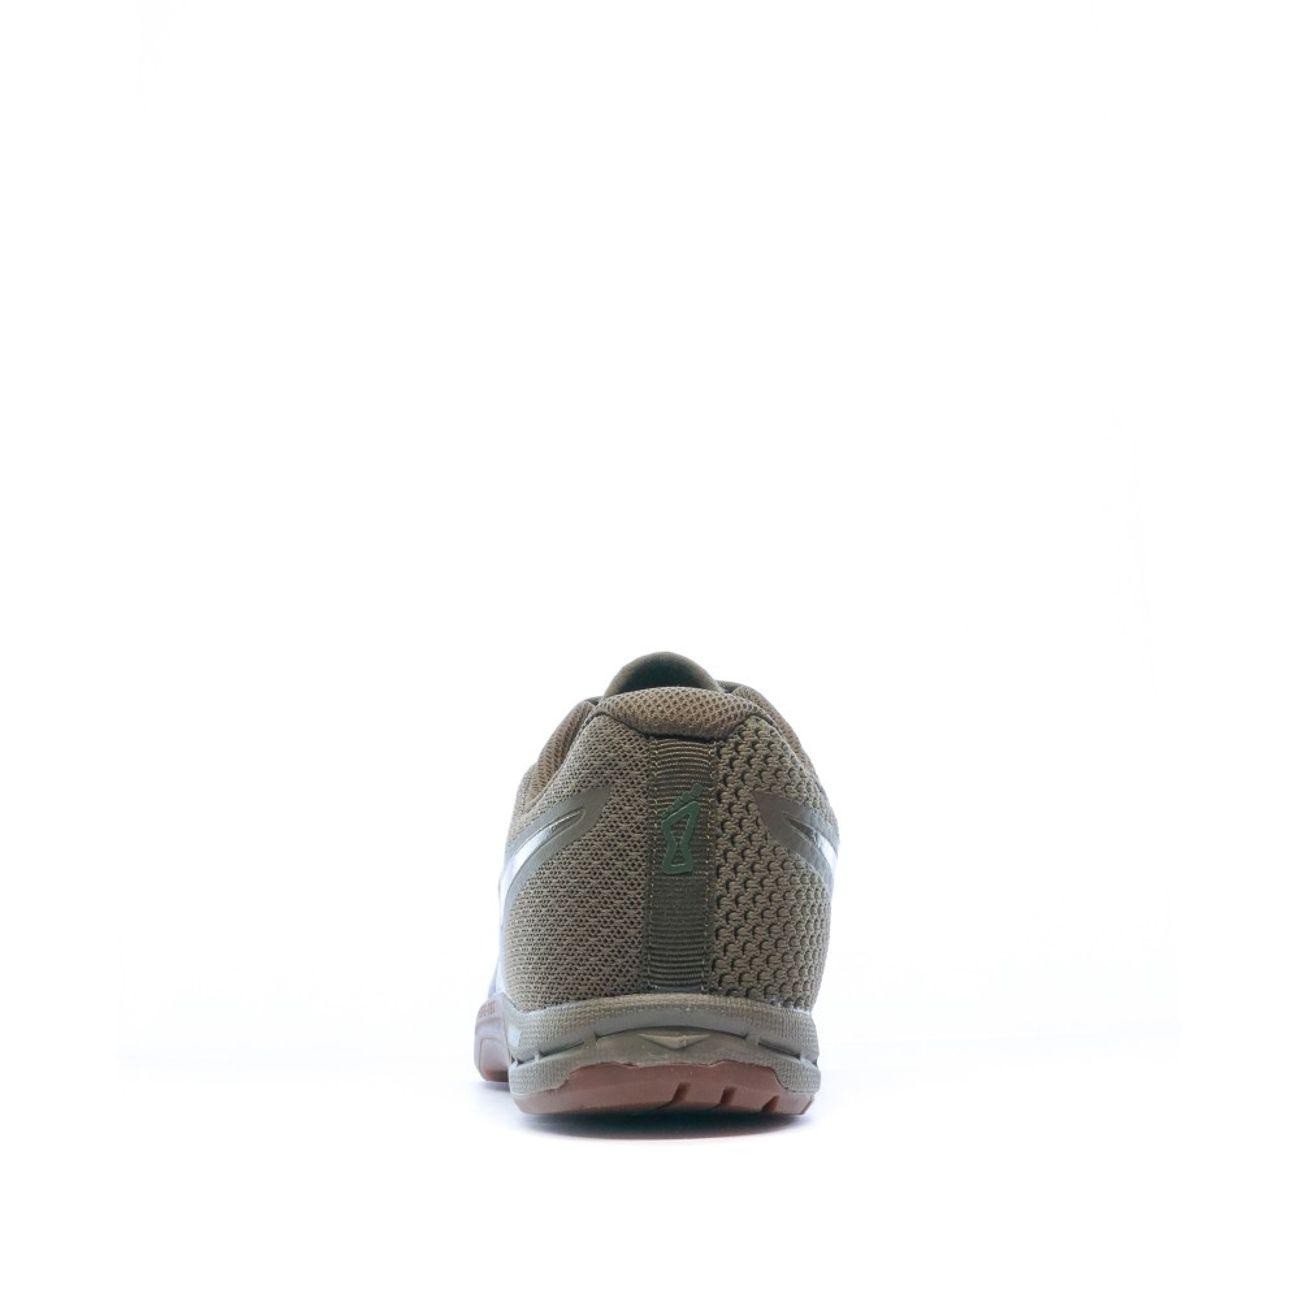 Mode- Lifestyle homme INOV 8 Chaussures Training Kaki Homme INOV8 F-LITE235 v3